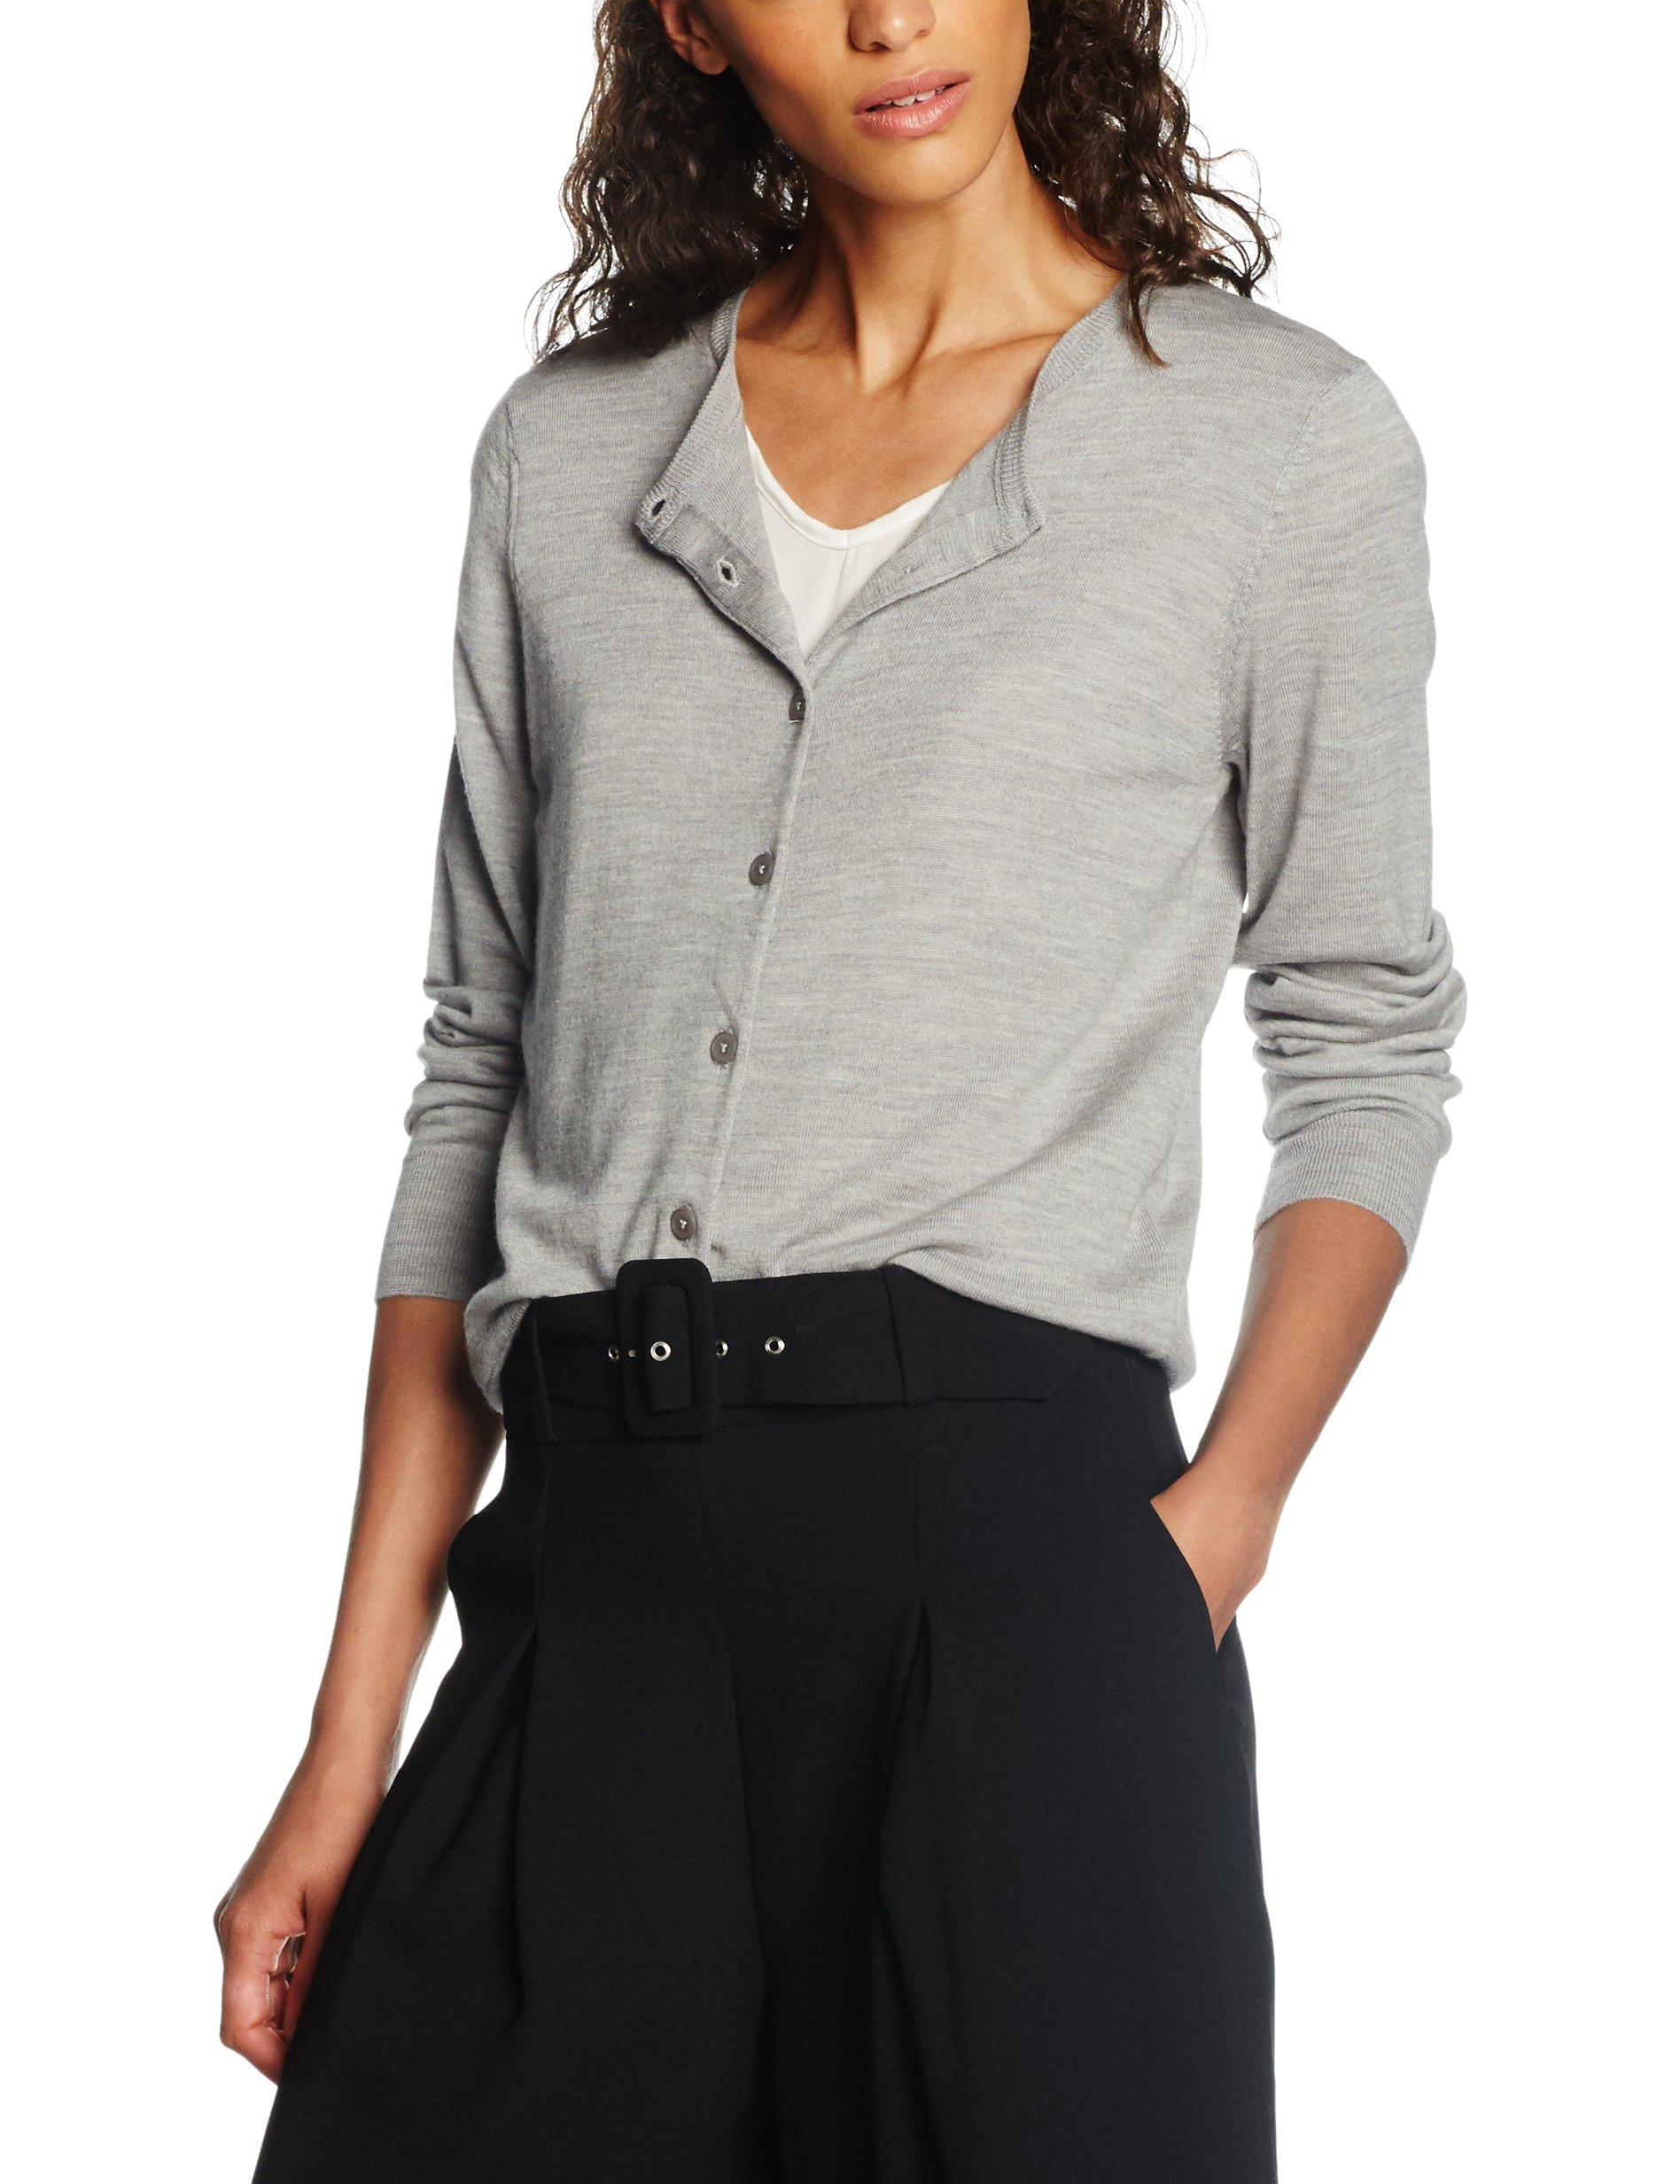 CardiGilet large GreyX Short K FemmeGrislight Filippa Merino jL54R3Aq